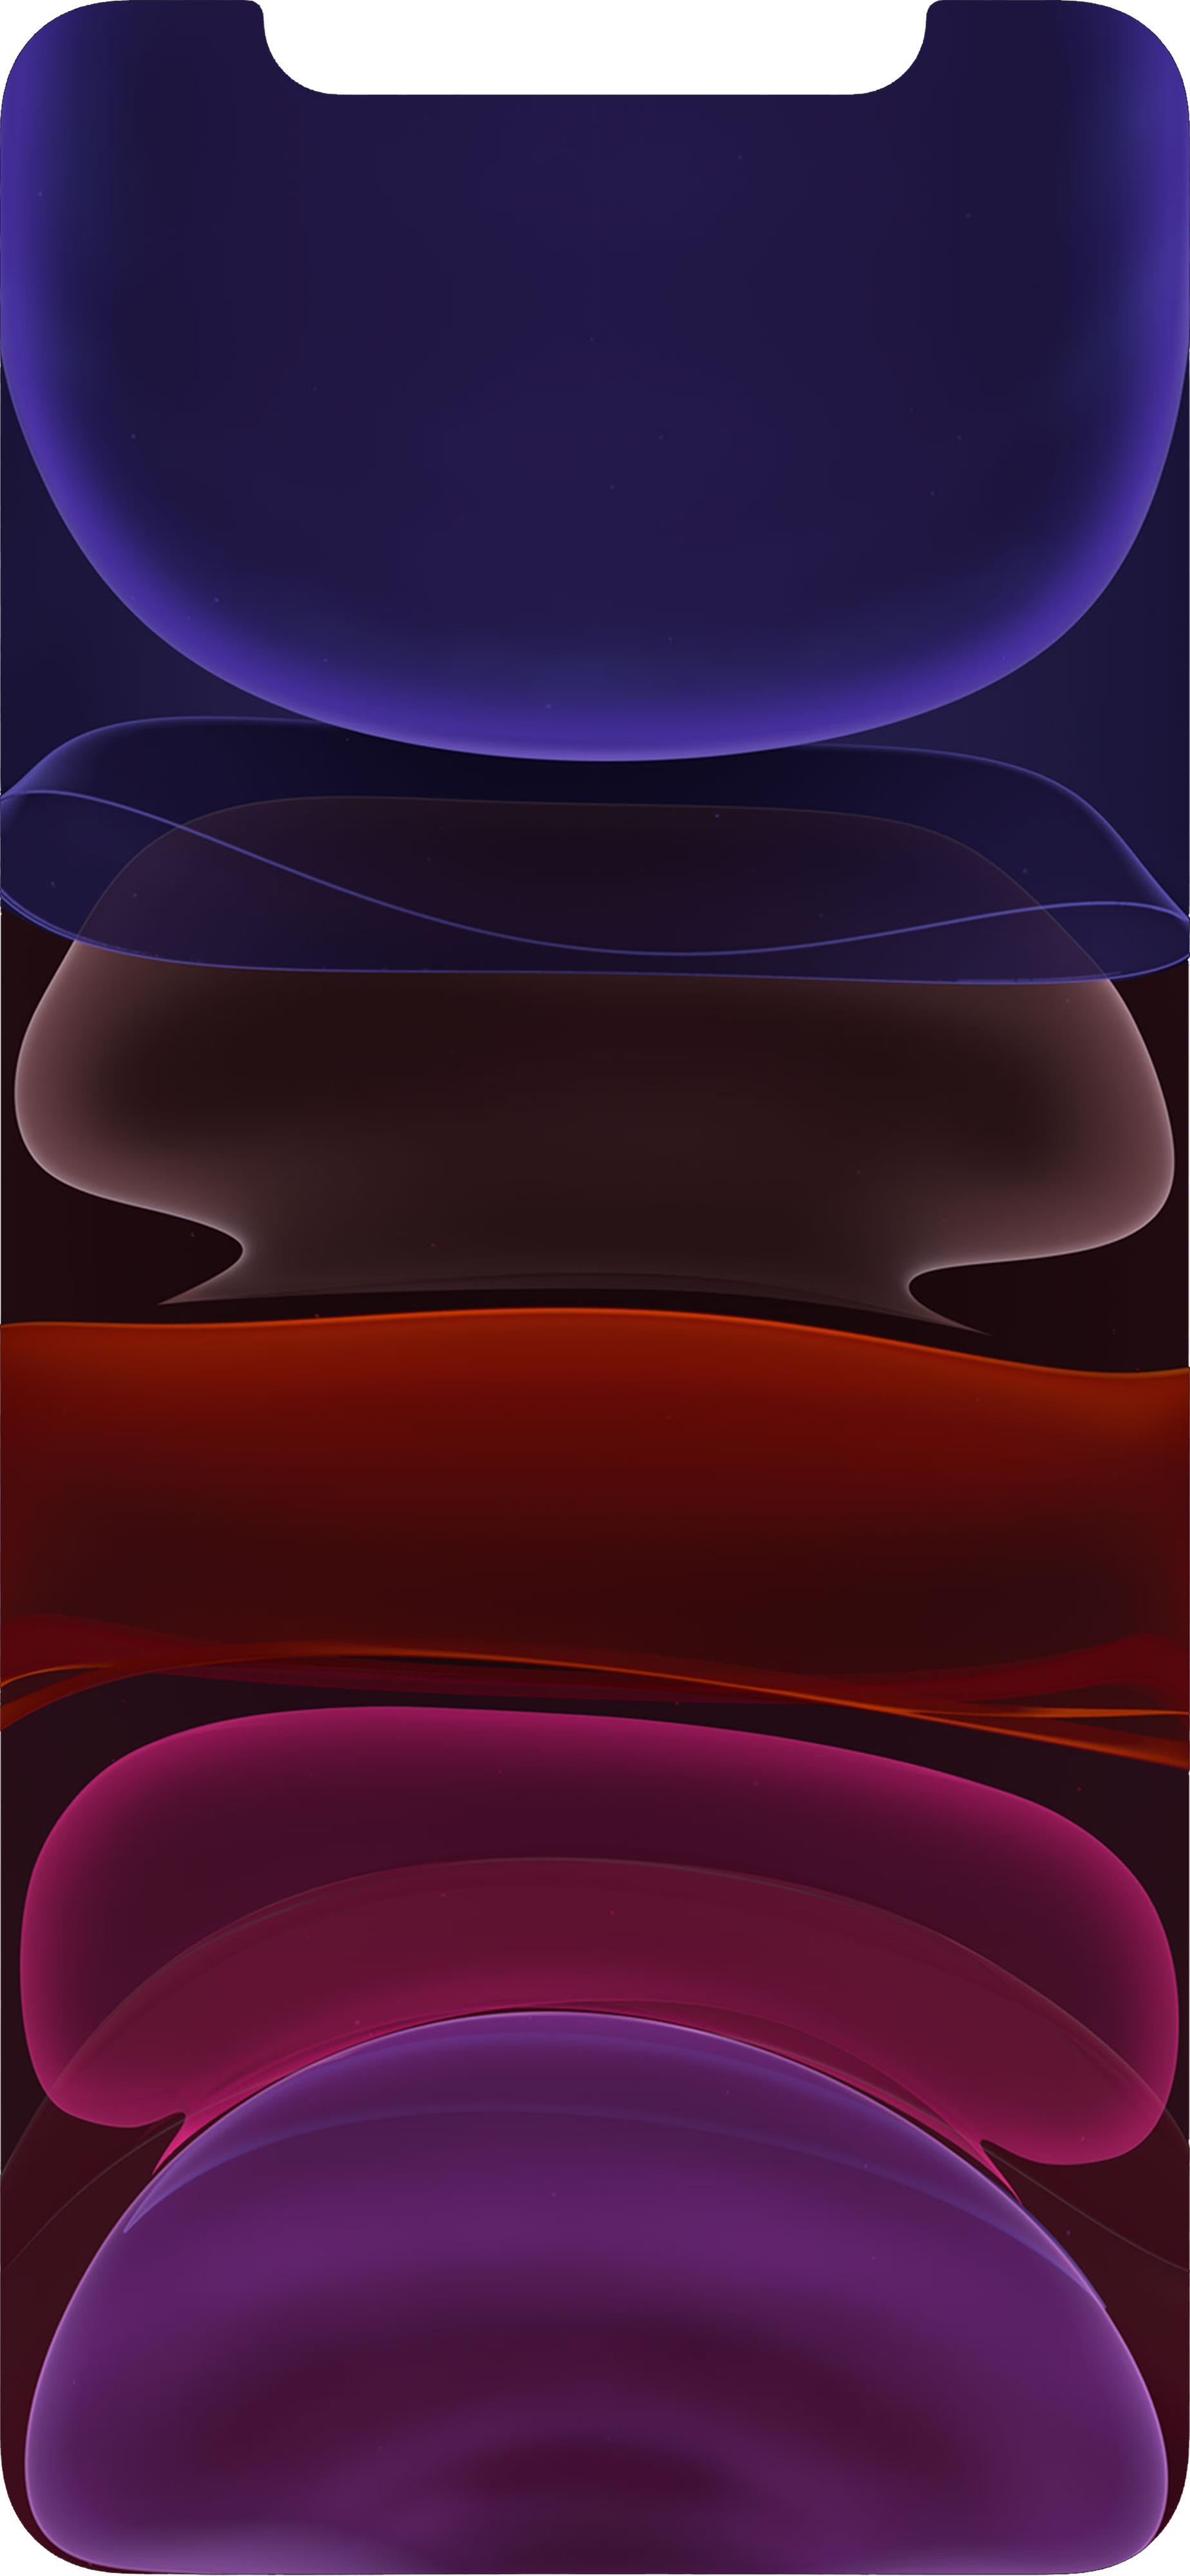 iphone-11-purple-wallpaper-TechFoogle